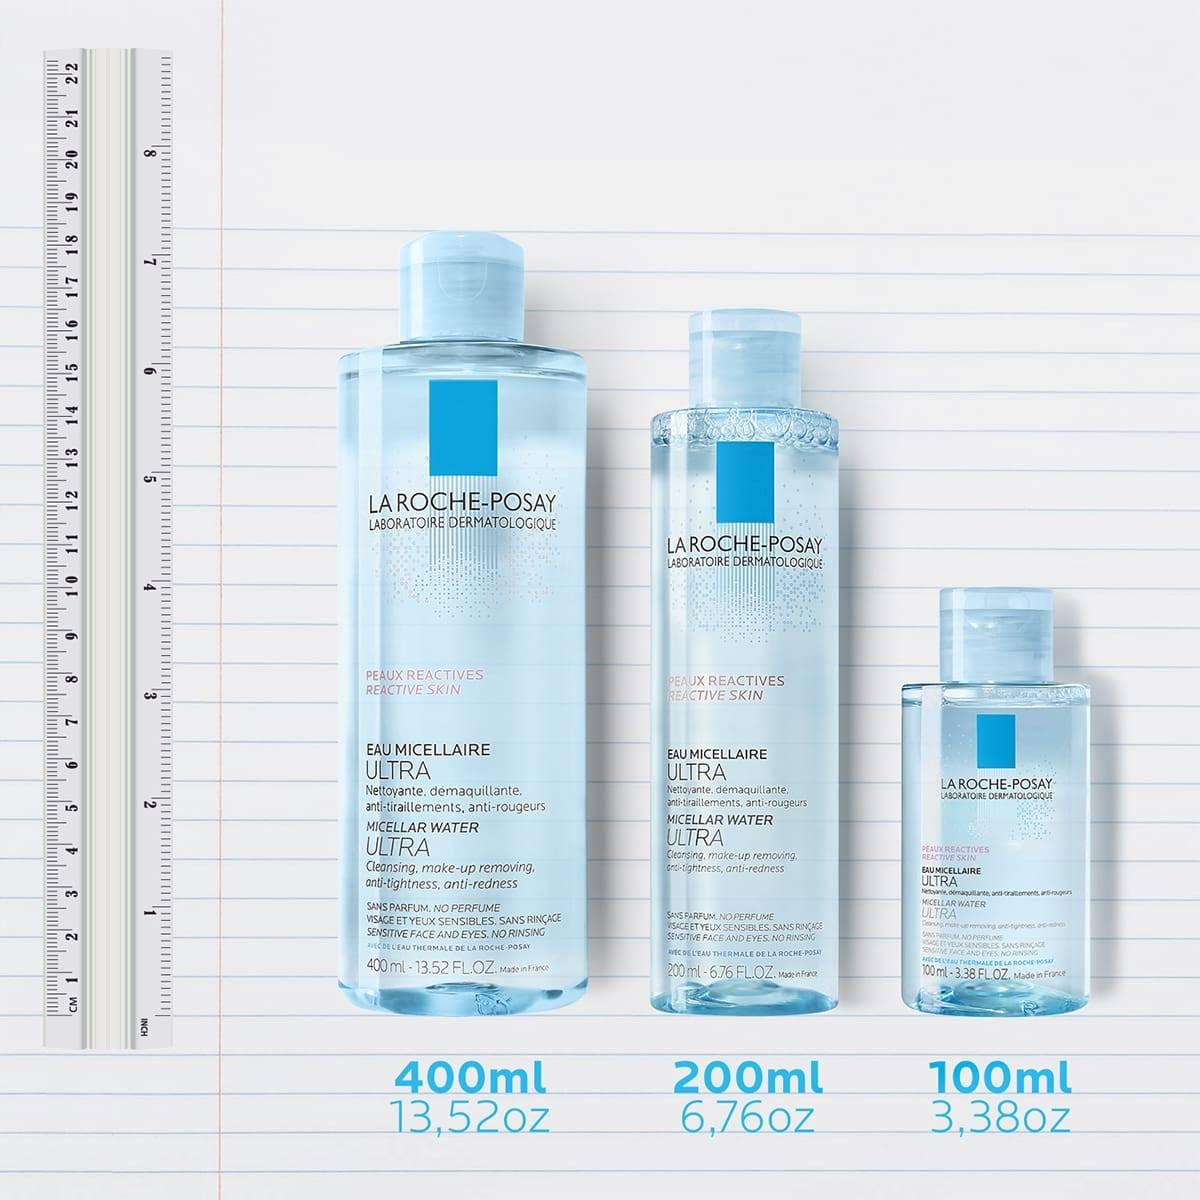 La Roche Posay ProduktSide Micellar Water Ultra Family 3337875528108 3